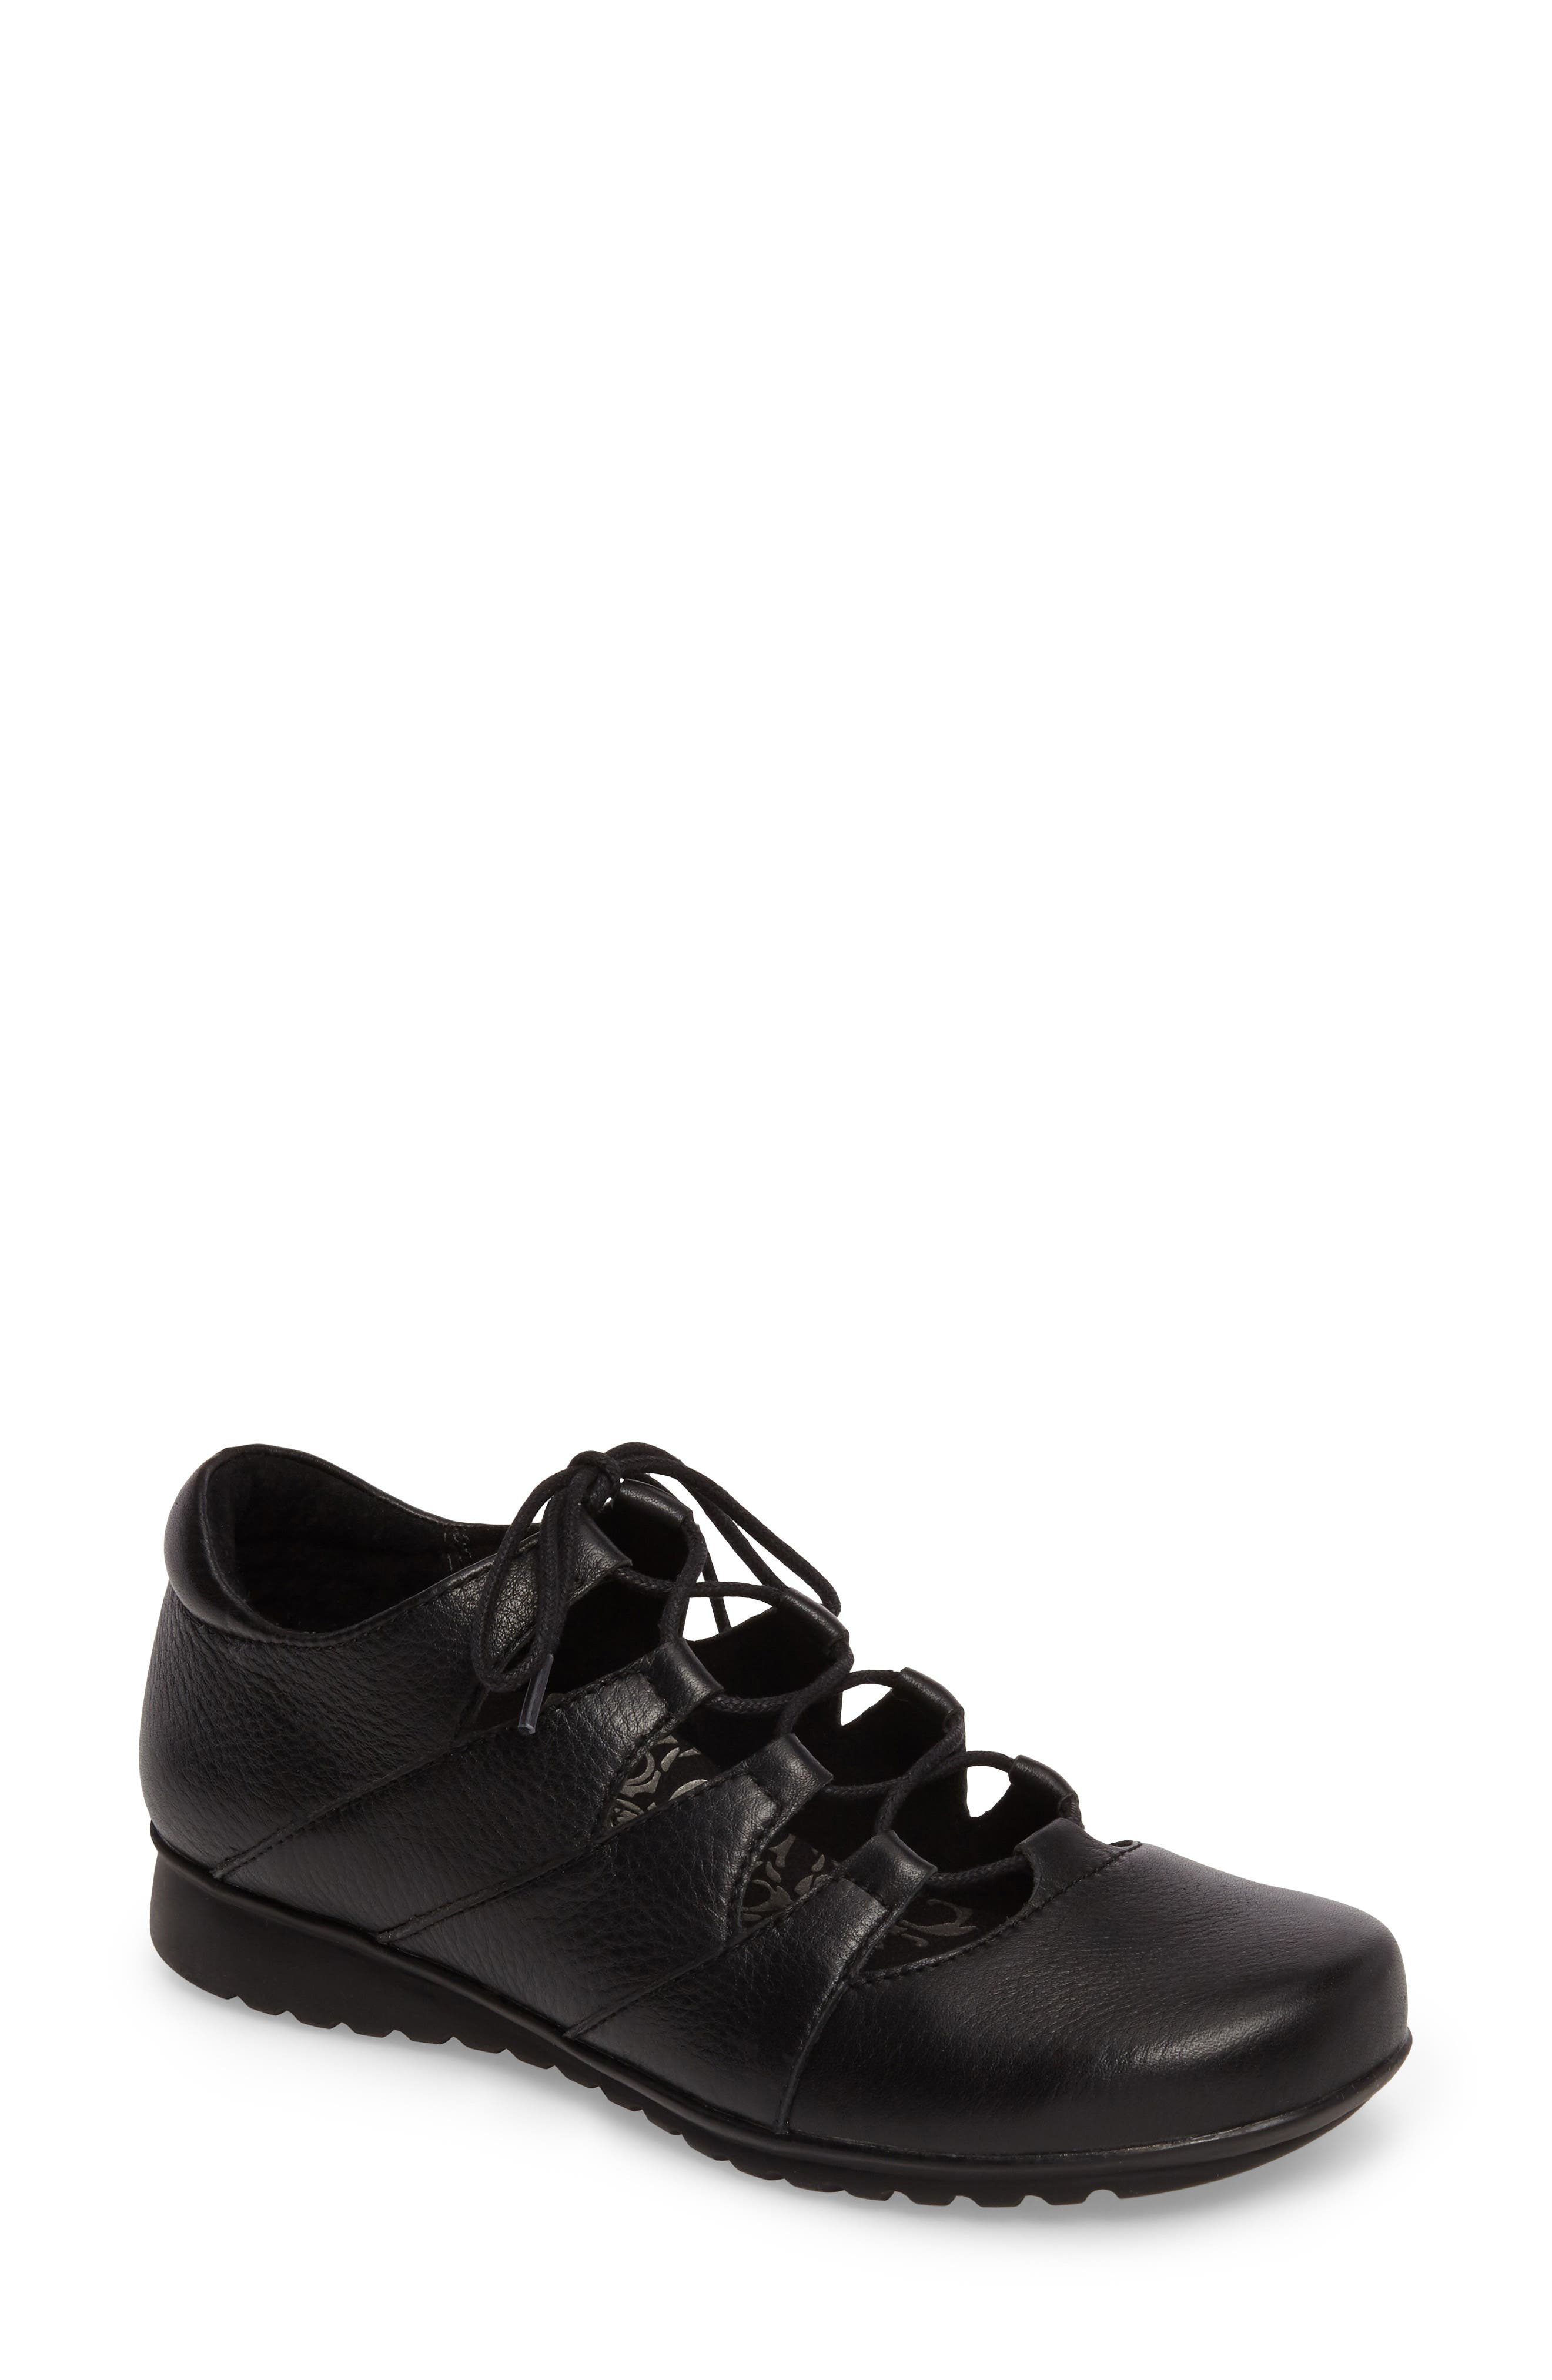 Sienna Cutout Sneaker,                             Main thumbnail 1, color,                             BLACK LEATHER/ BLACK